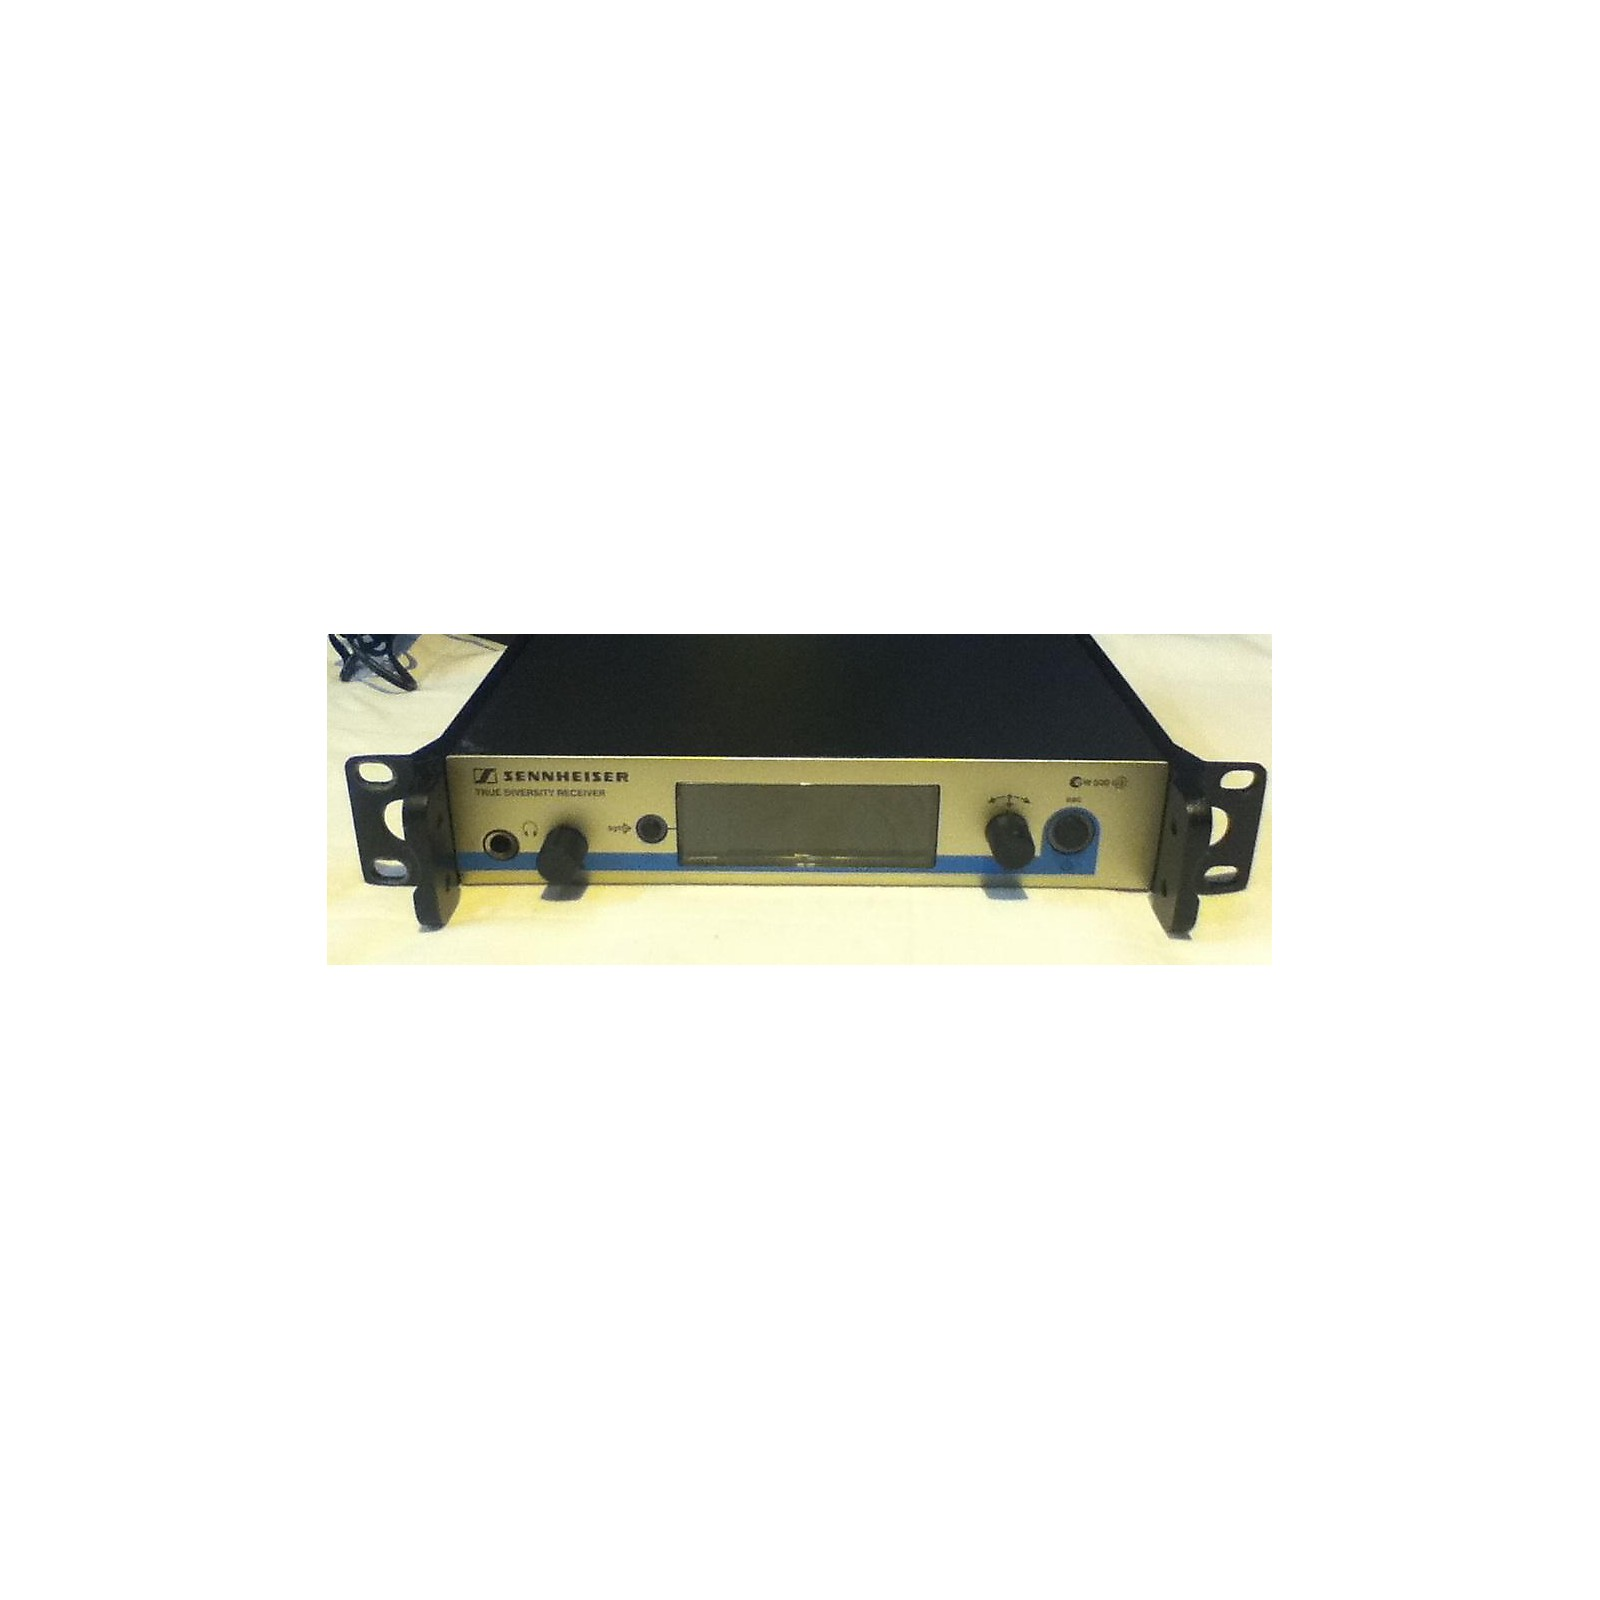 Sennheiser Ew500g3 Handheld Wireless System